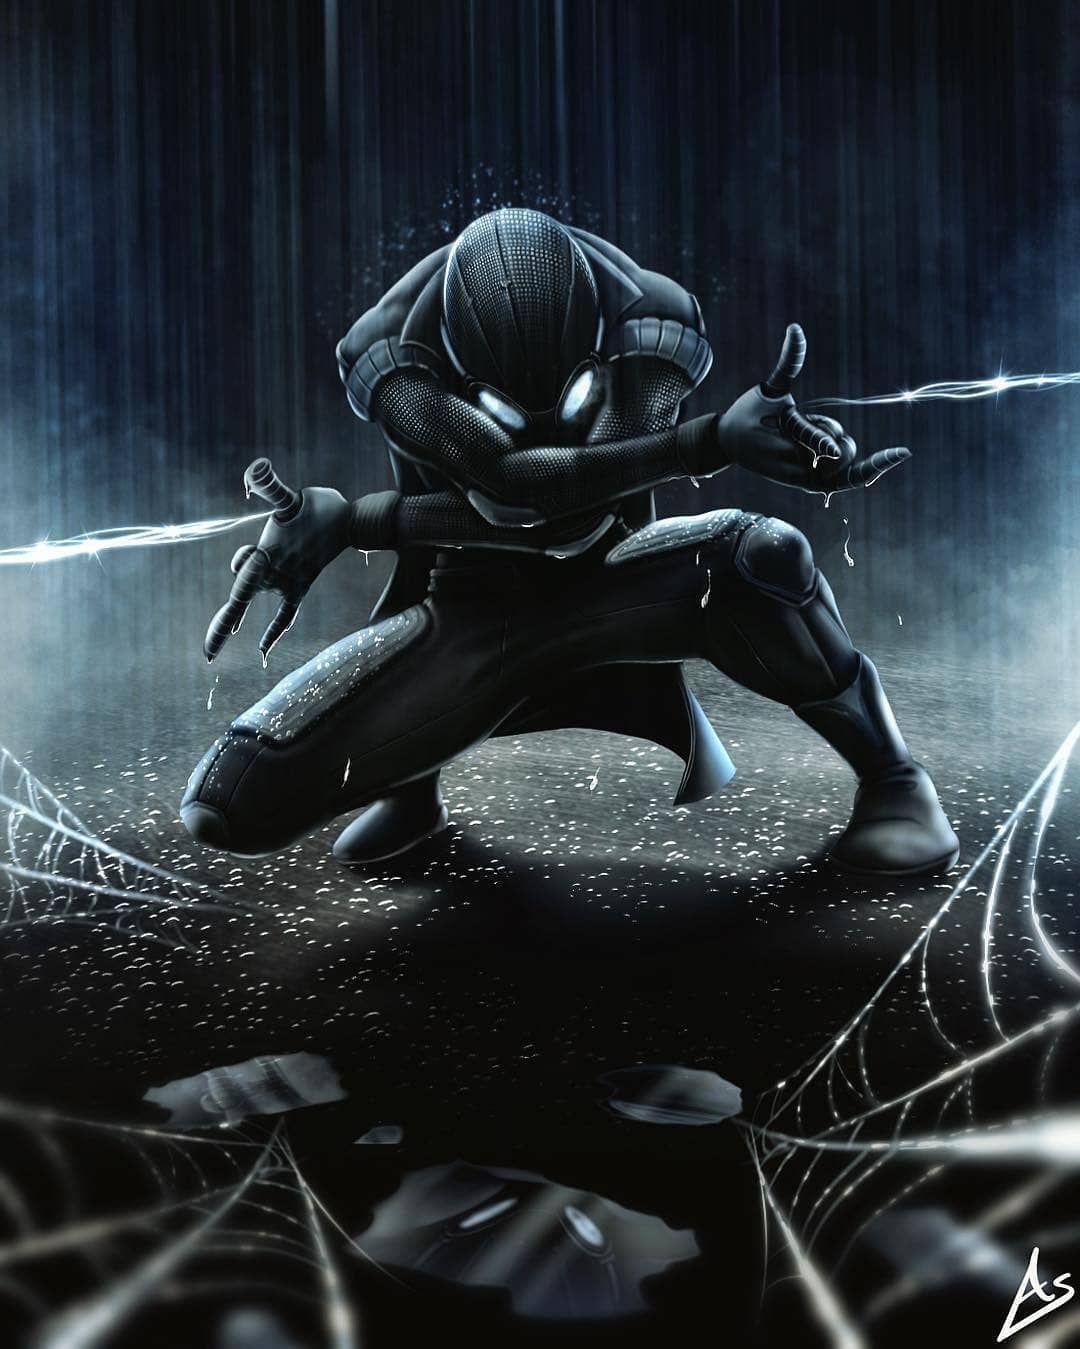 NEW VENOM CARNAGE SPIDERMAN MOVIE FIGURE Signed Comic Con ART PRINT 13x19 POSTER